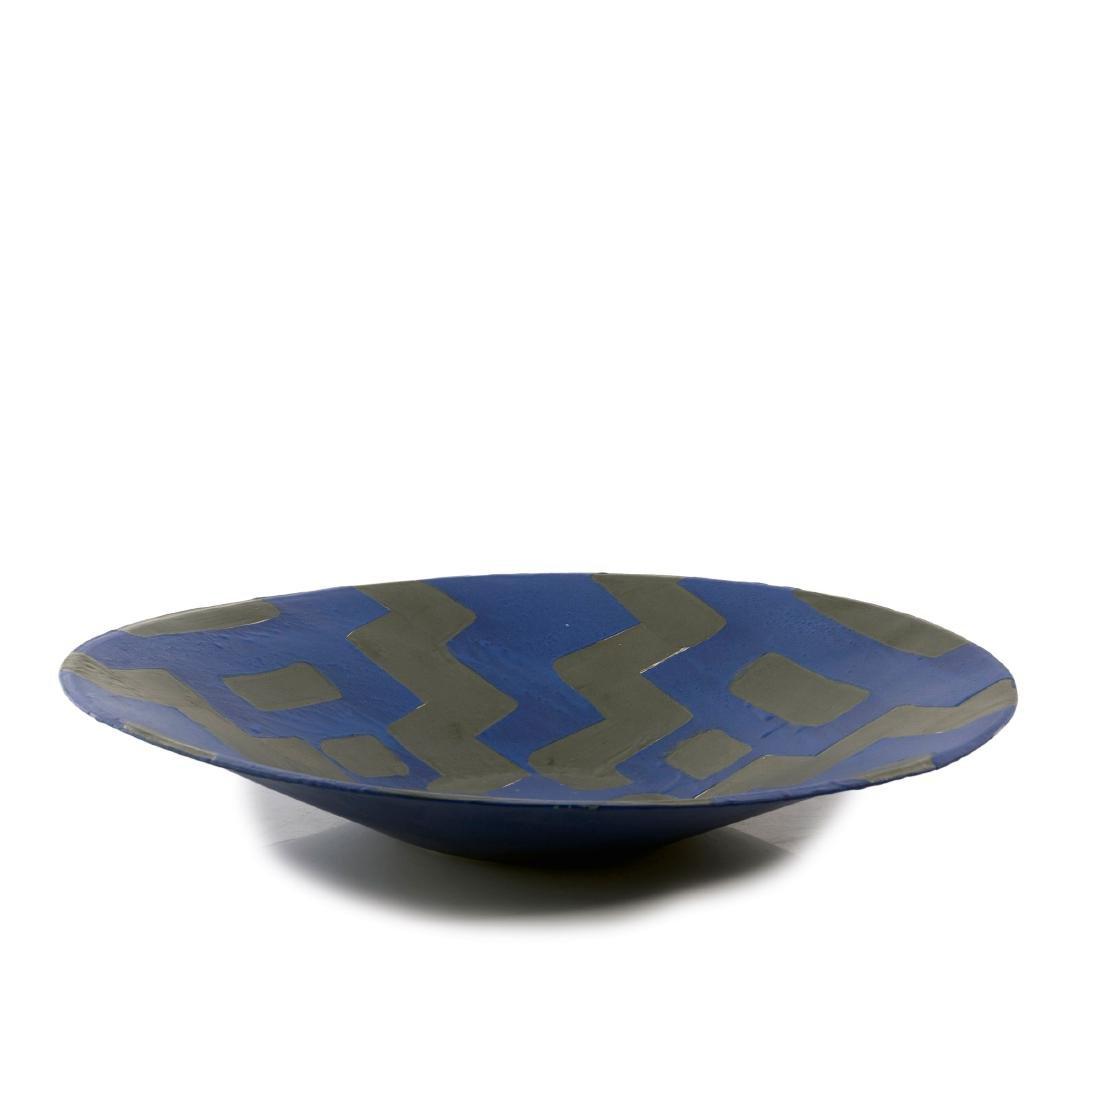 Large 'African' bowl, 1991